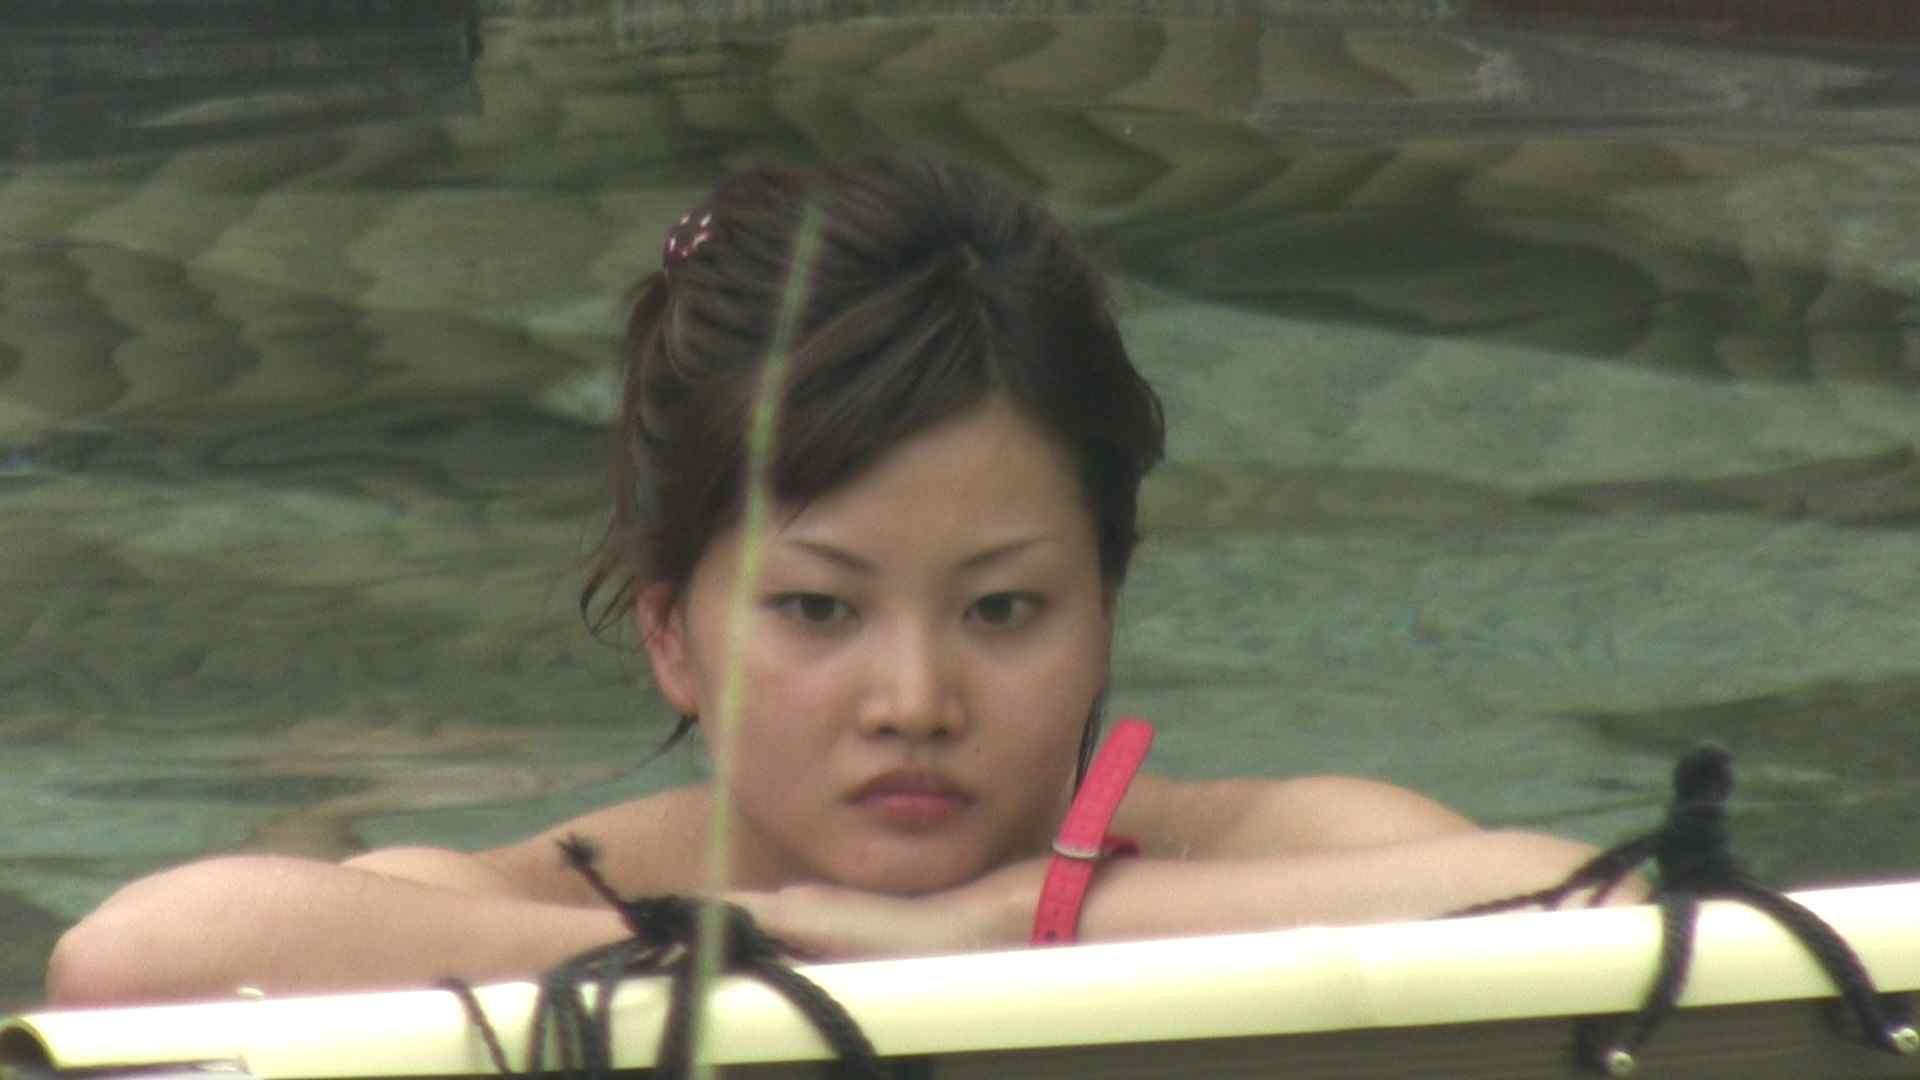 Aquaな露天風呂Vol.125 OLのプライベート  10pic 6